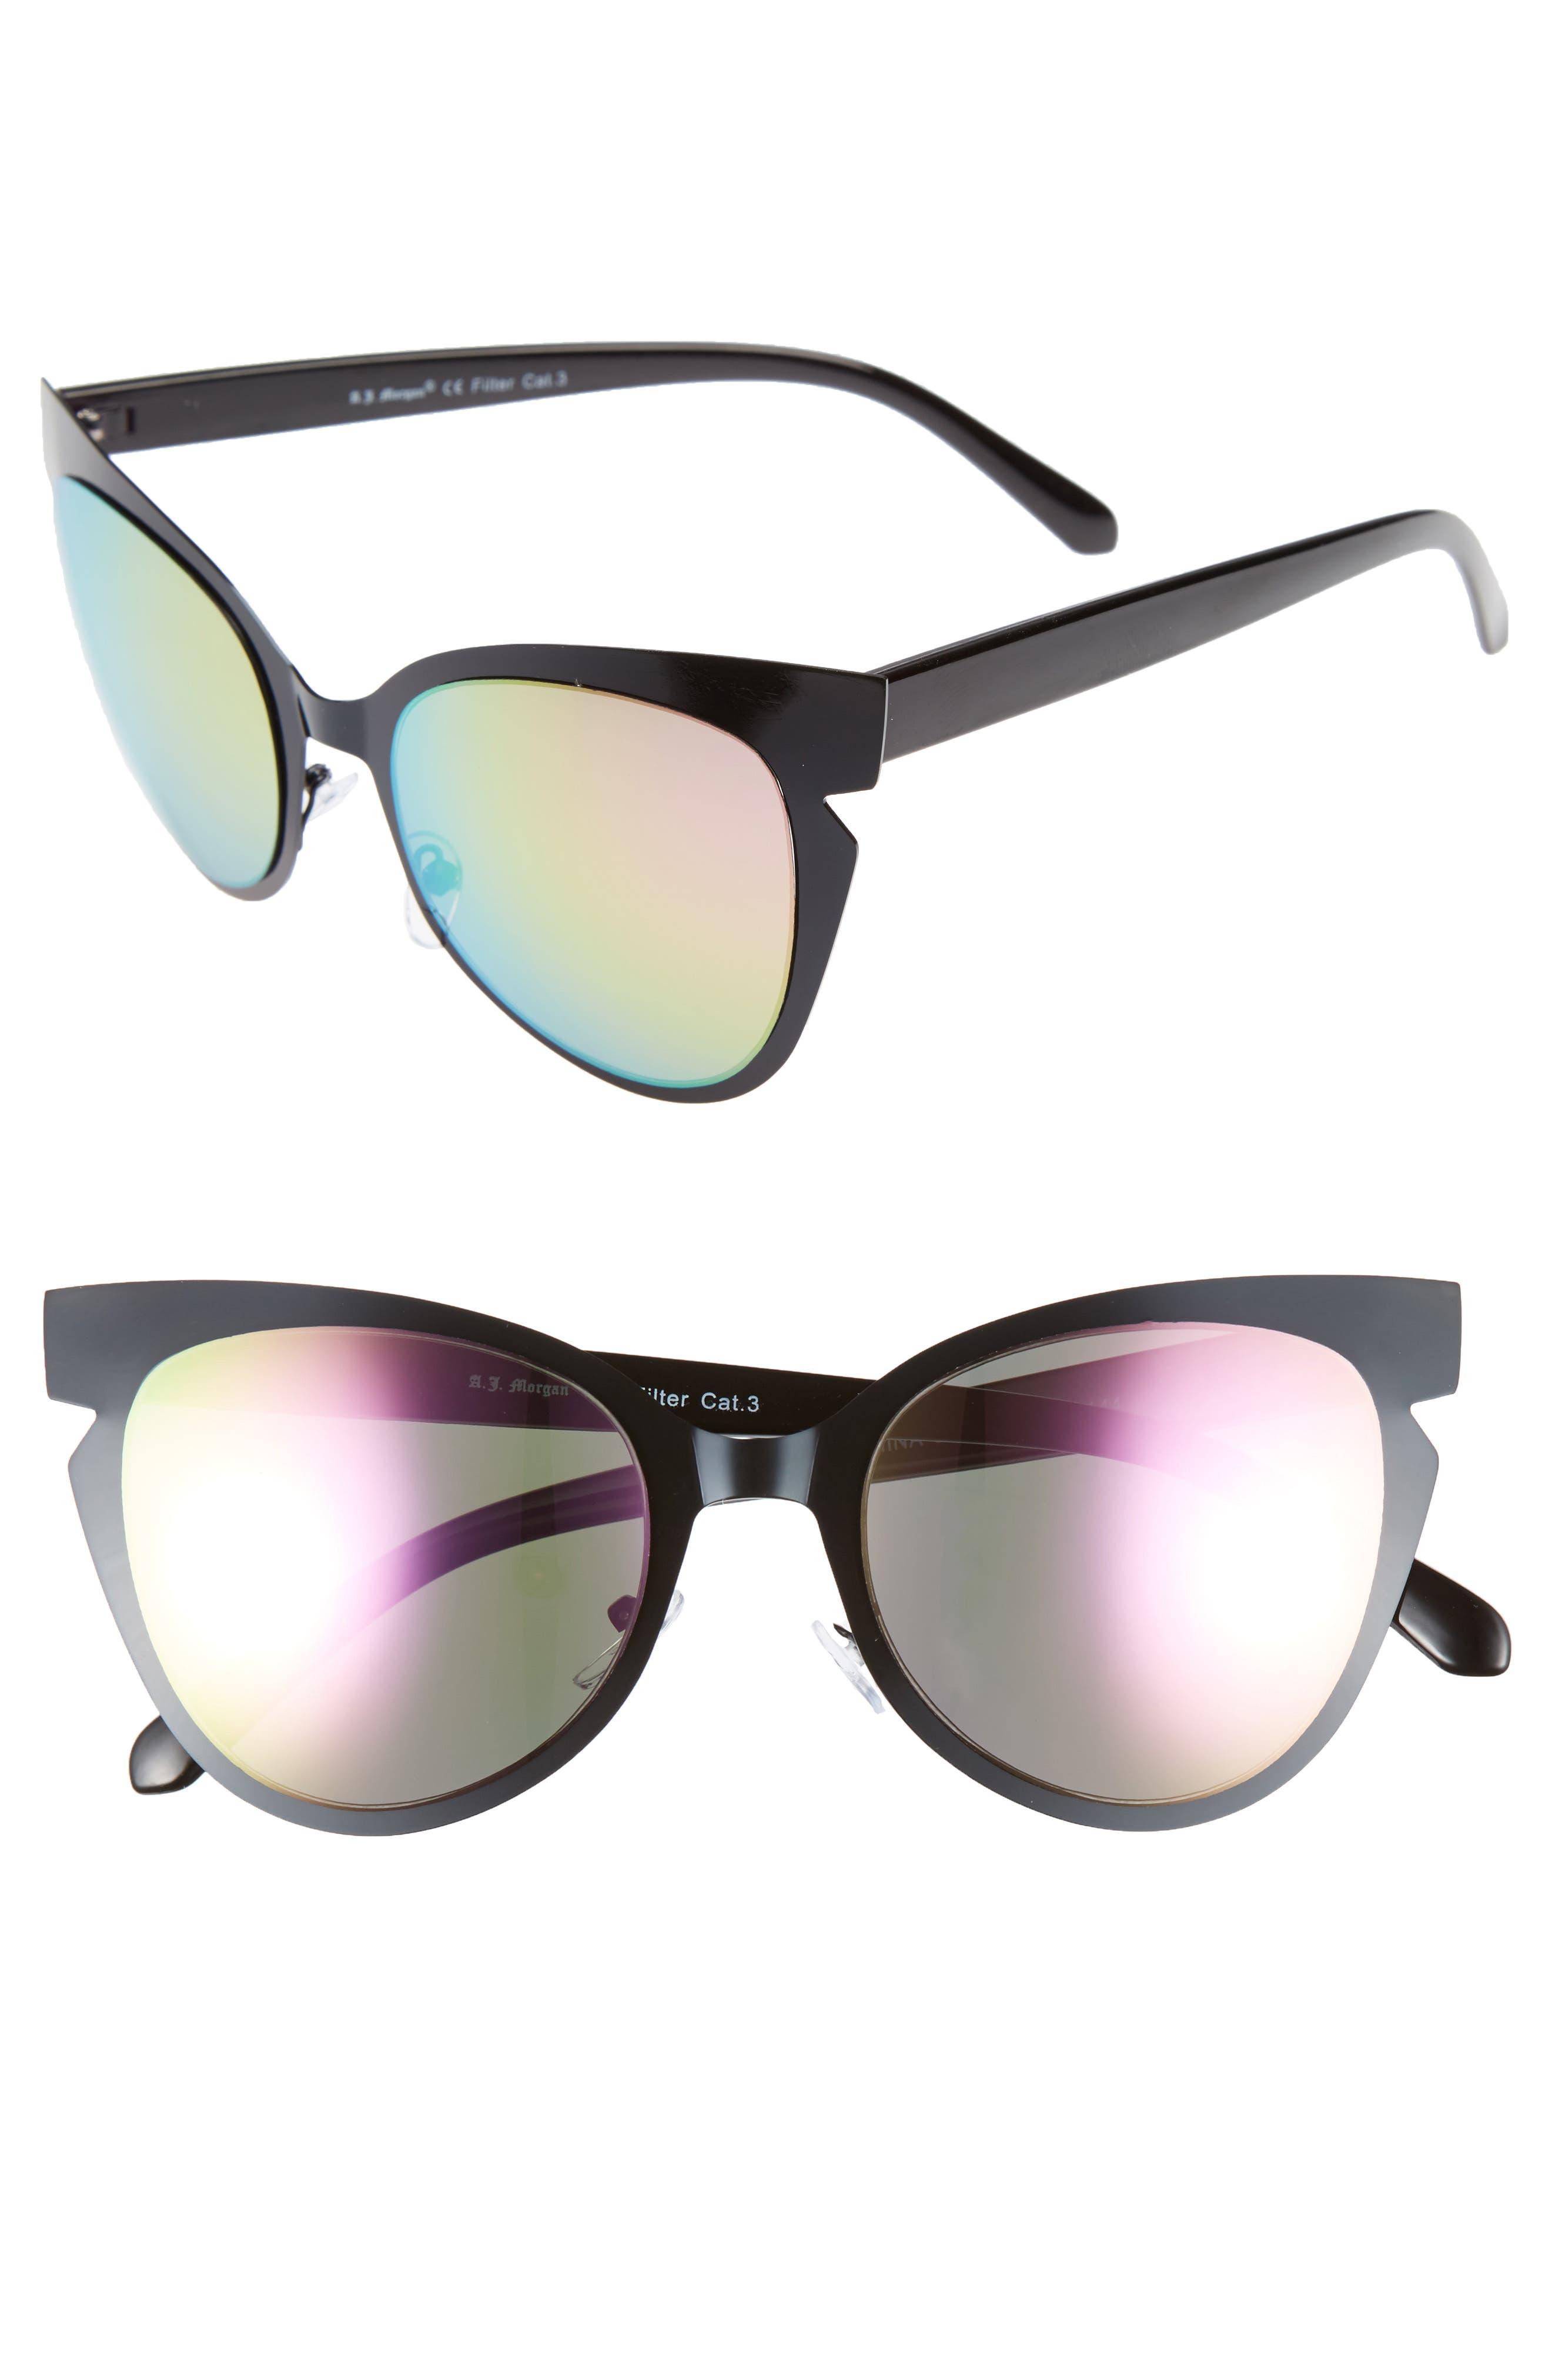 A.J. MORGAN Buns 53mm Cat Eye Sunglasses